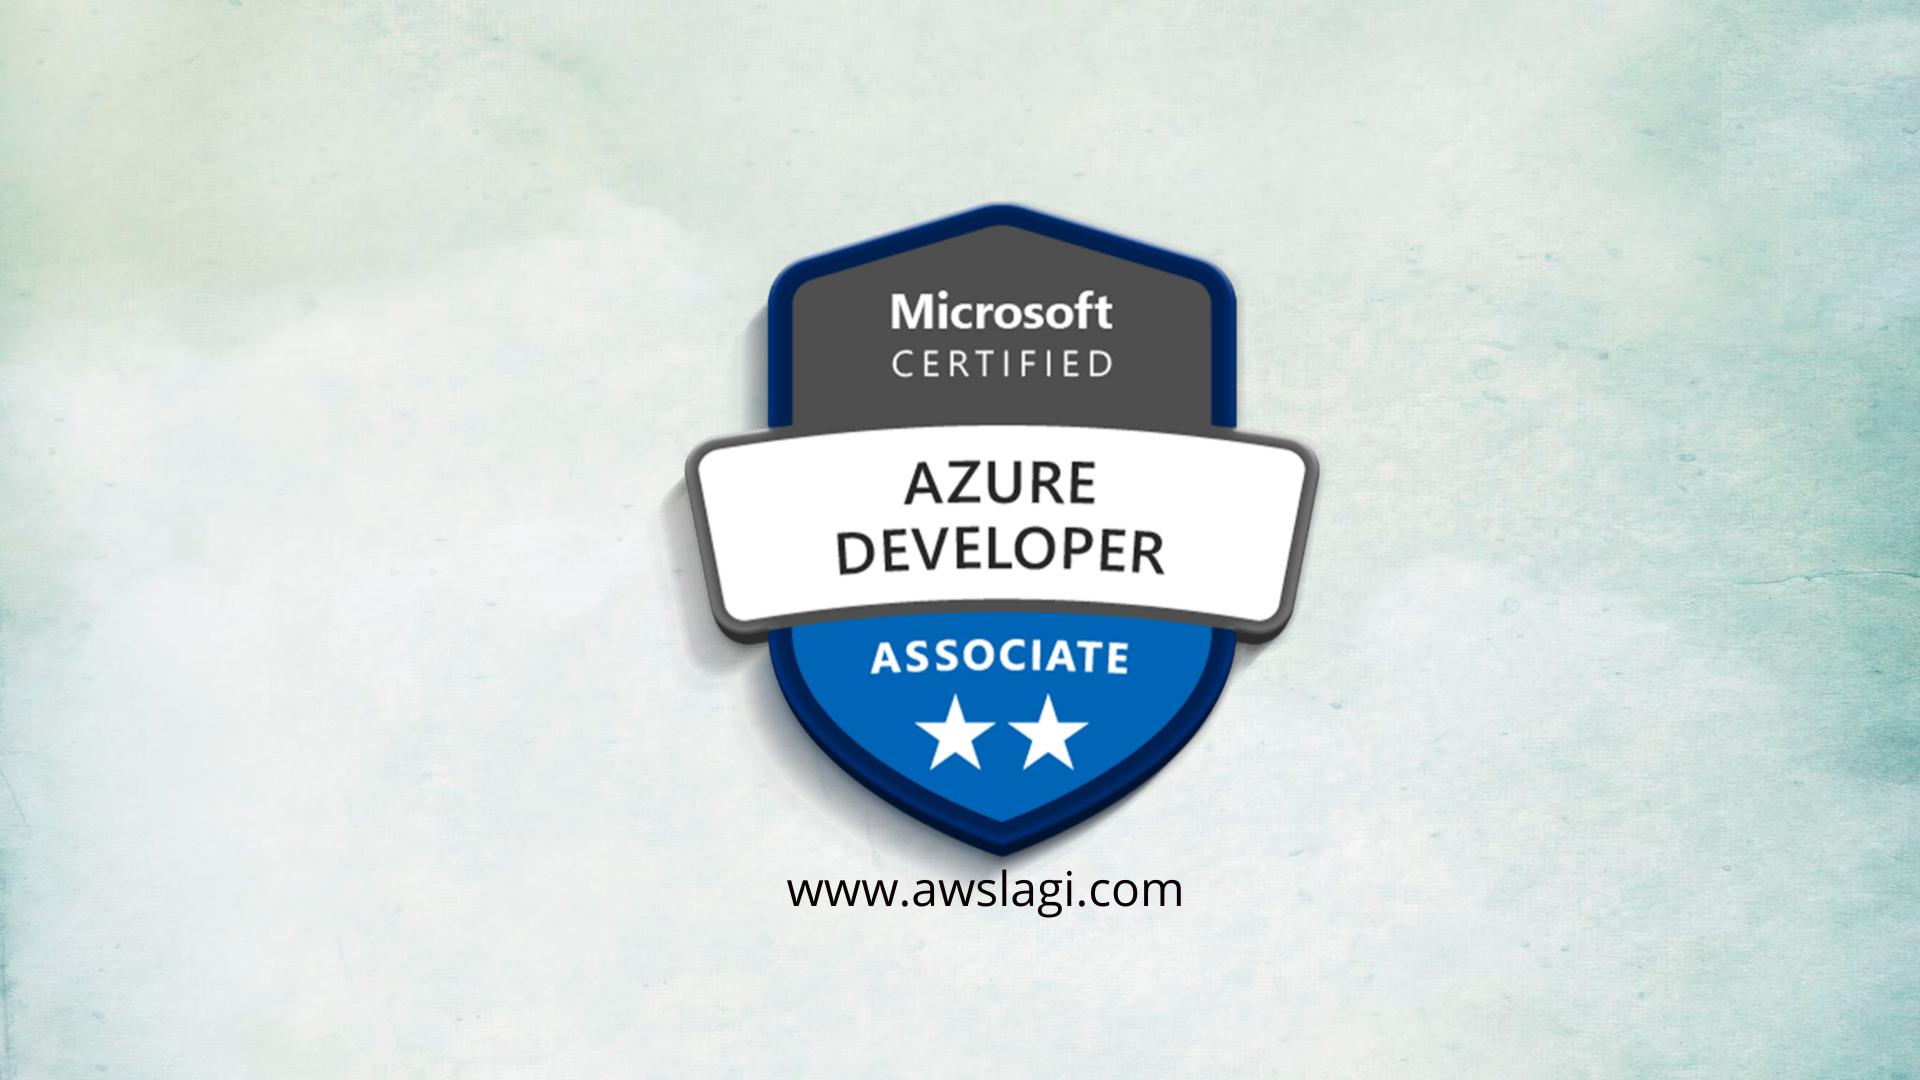 microsoft-azure-certified-developer-az-204-actual-exam-logo